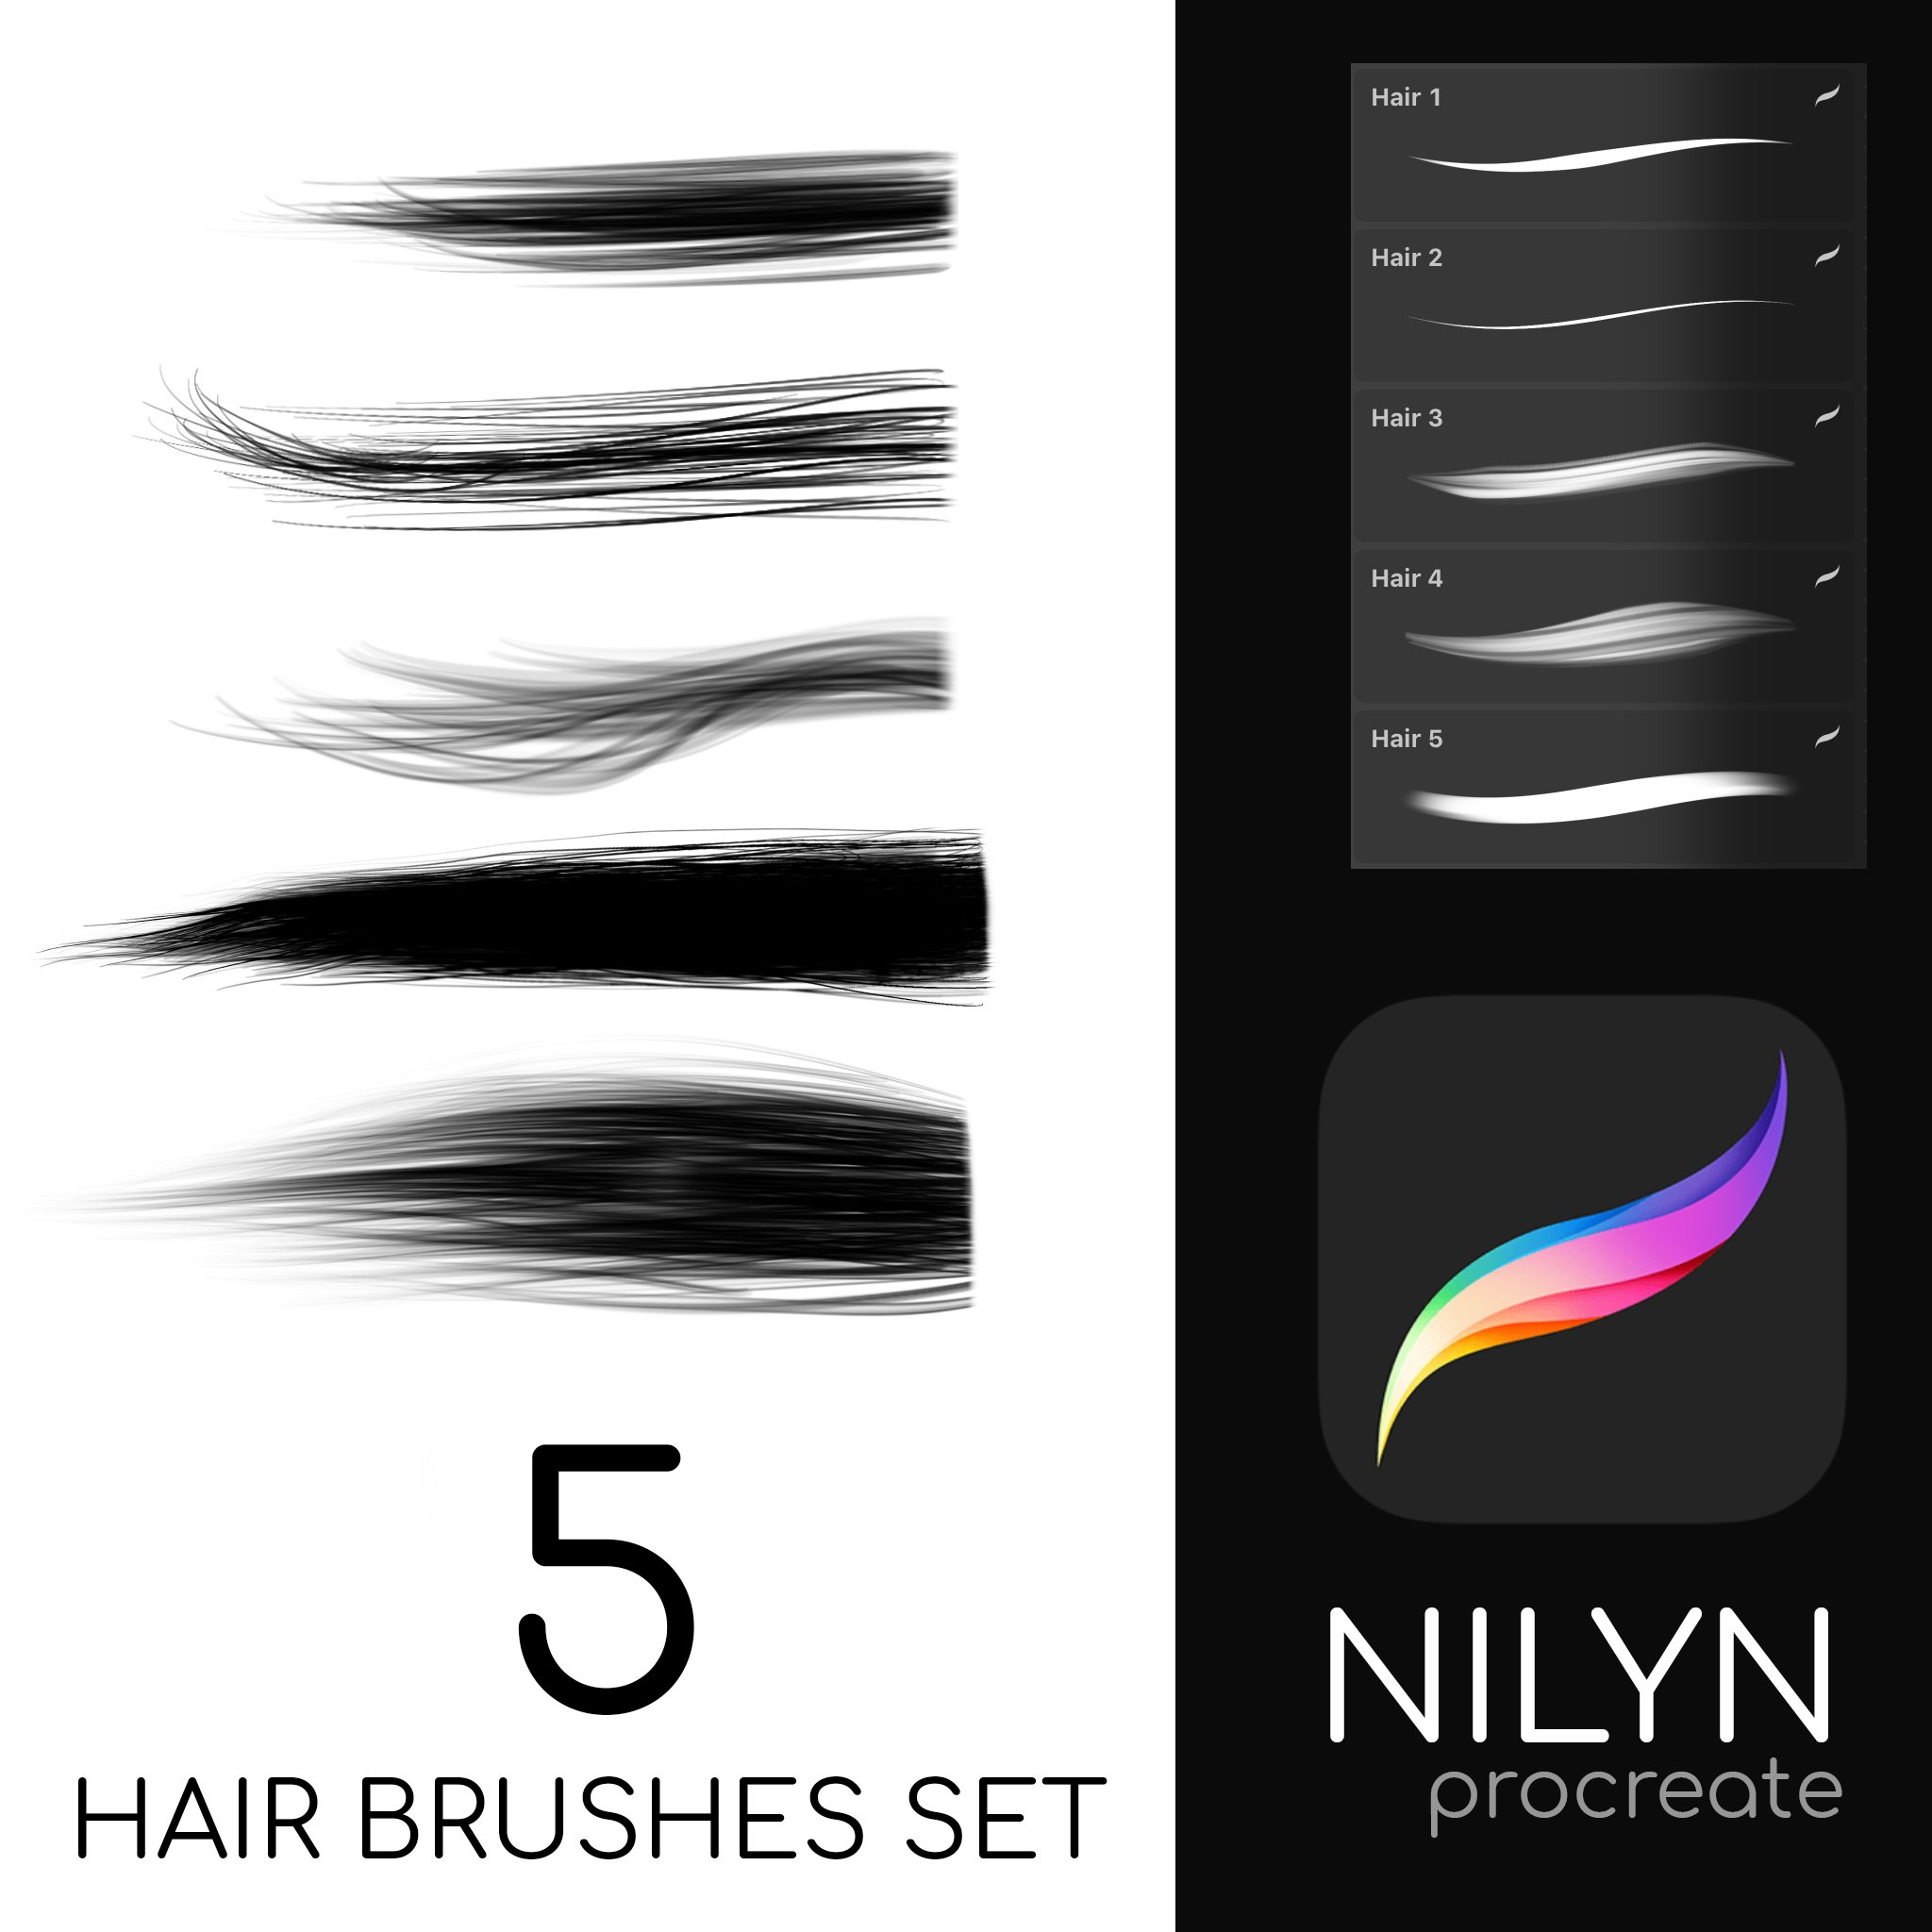 Nilyn Procreate - FREE HAIR brushes pack